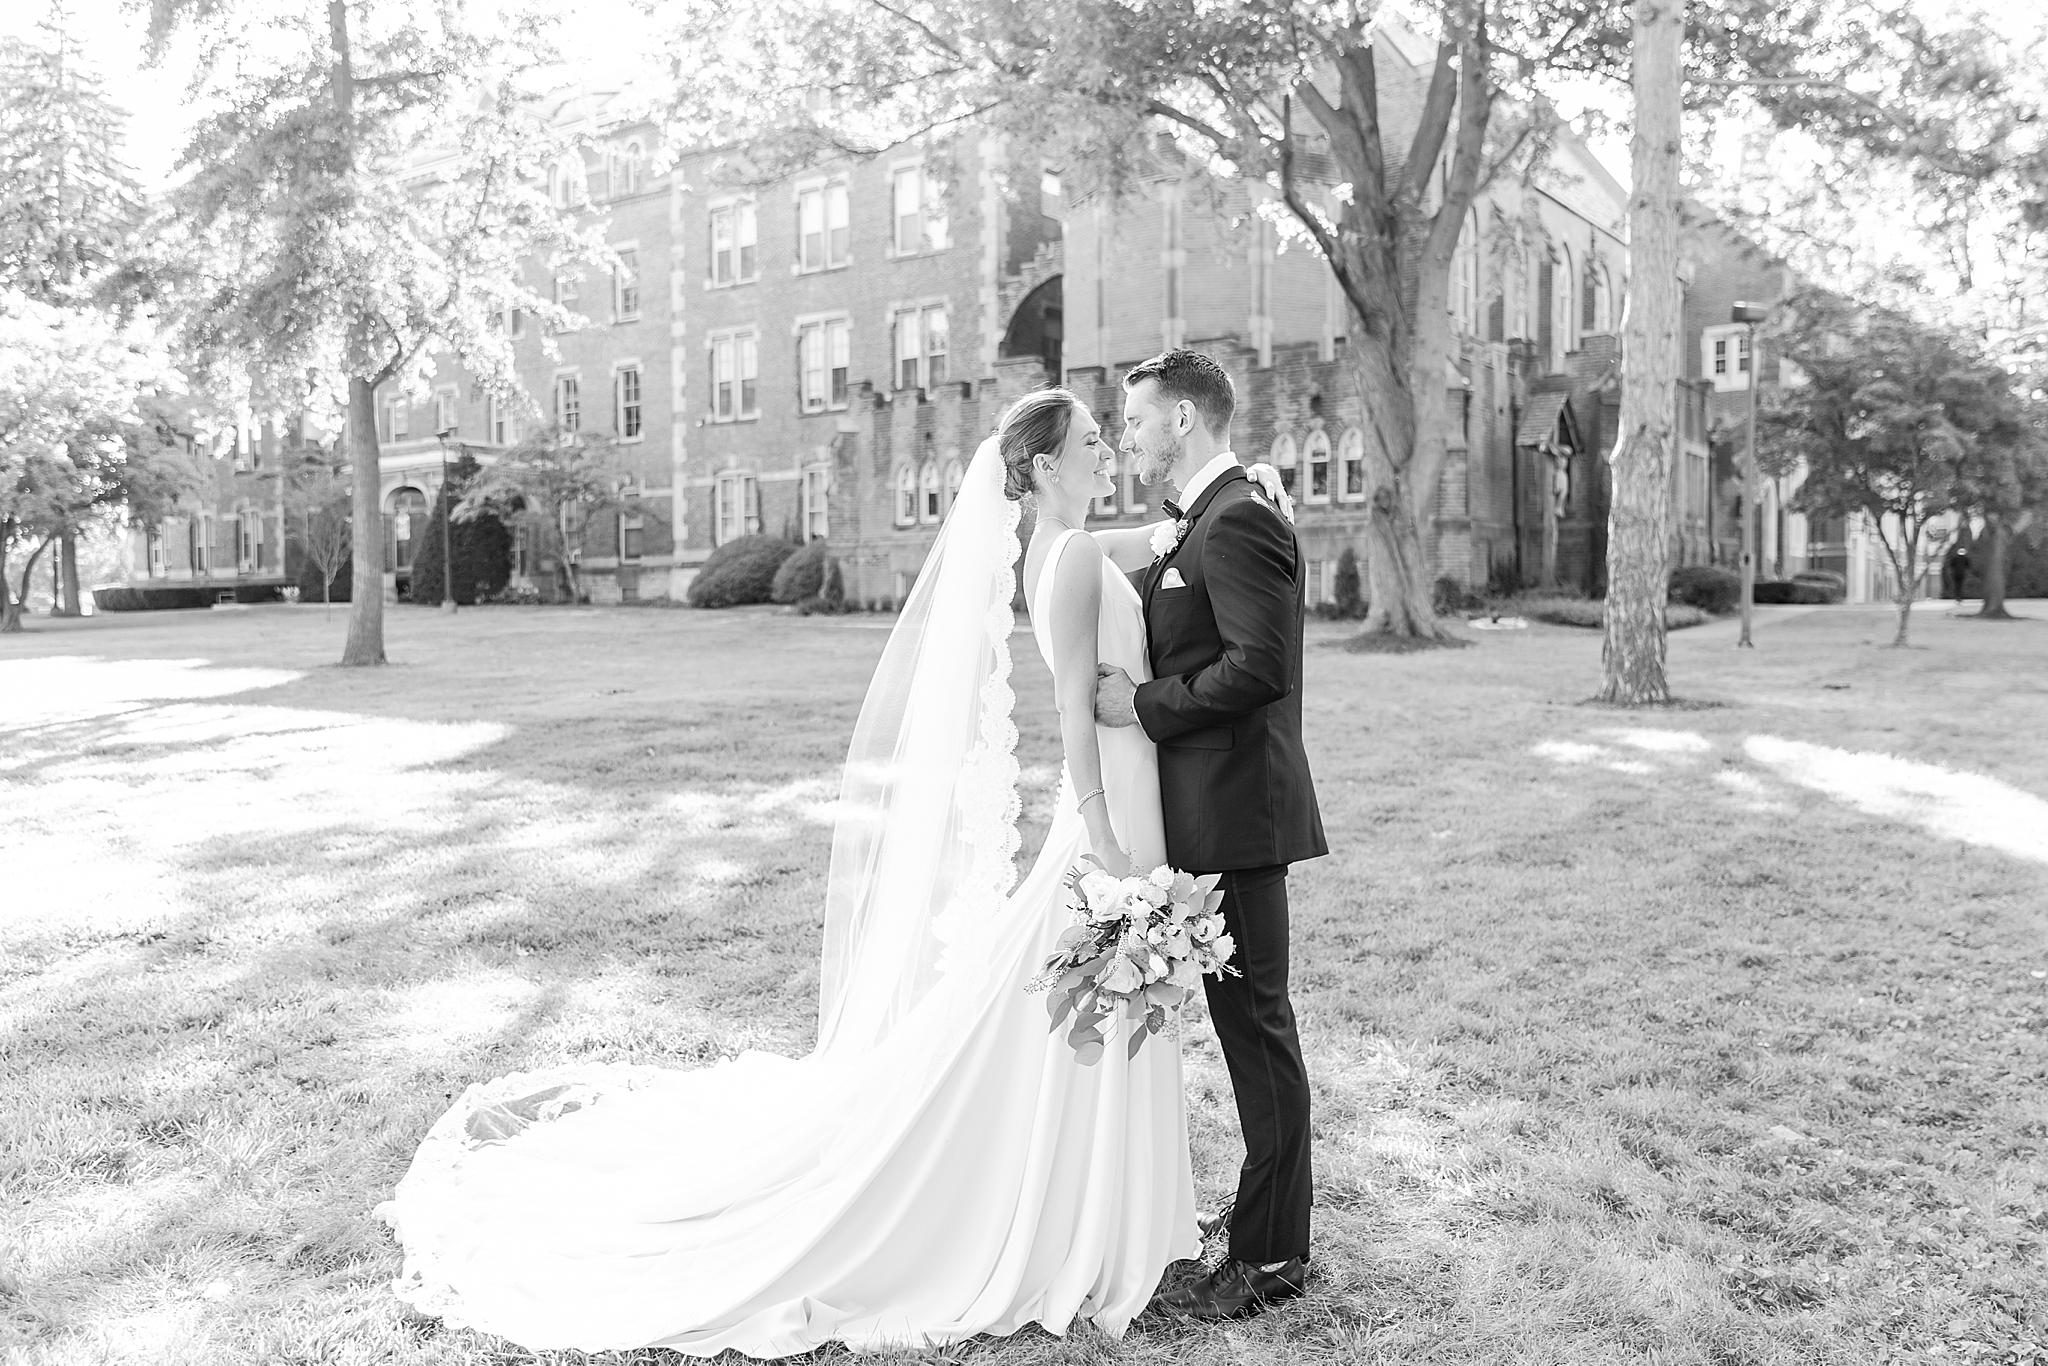 detroit-wedding-photographer-grosse-pointe-academy-chapel-detroit-golf-club-wedding-carly-matt-by-courtney-carolyn-photography_0072.jpg